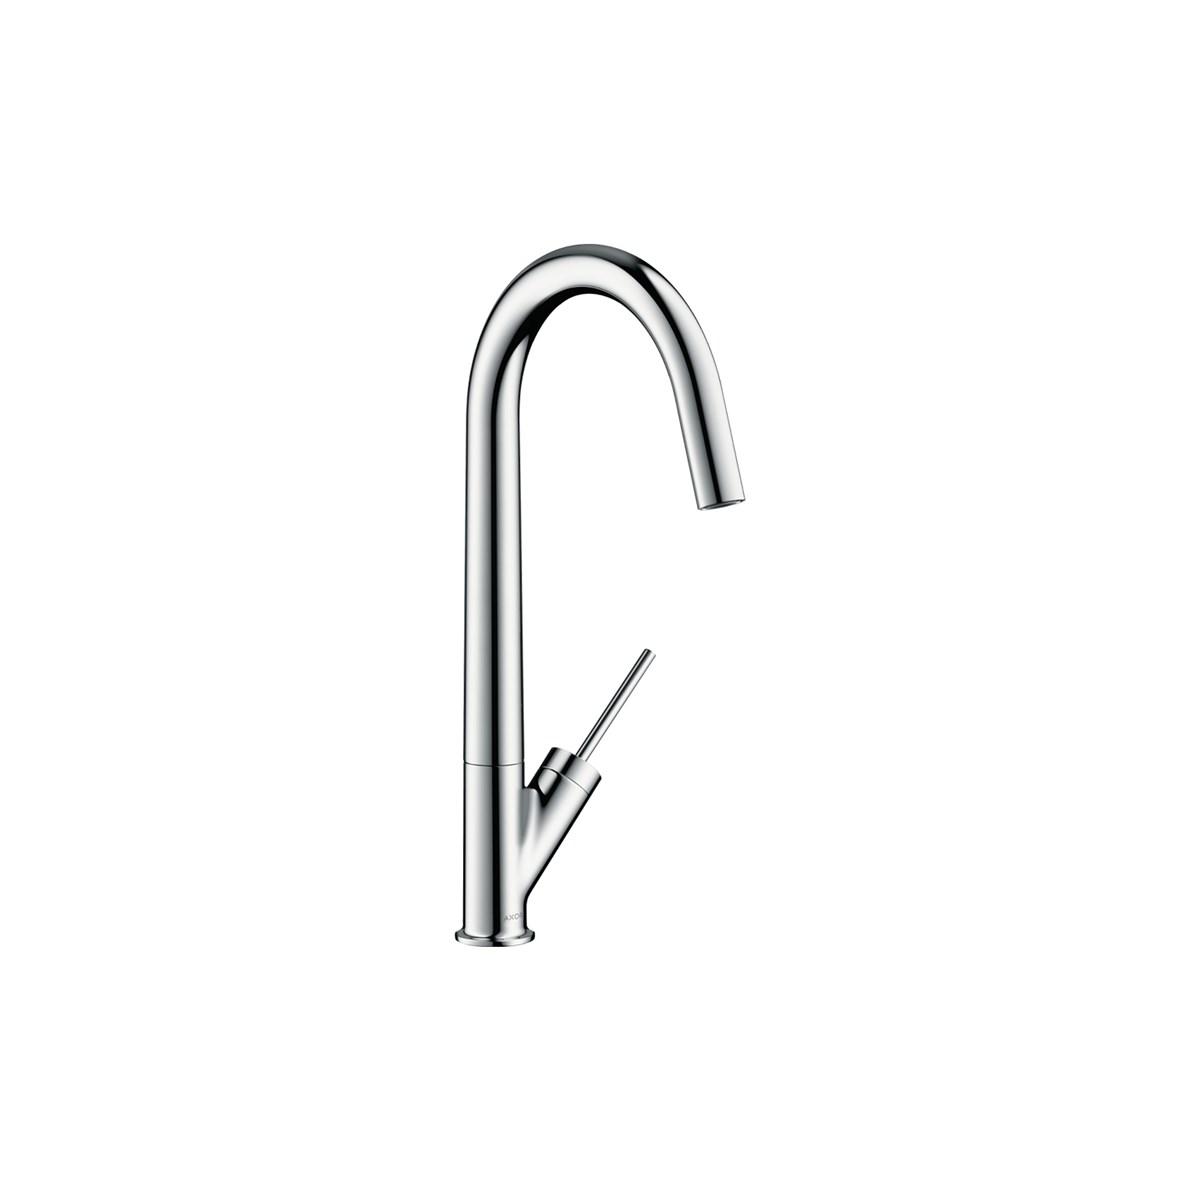 Hansgrohe-Philippe-Starck-AXOR-Starck-Kitchen-Mixer-300-12801000-Matisse-1